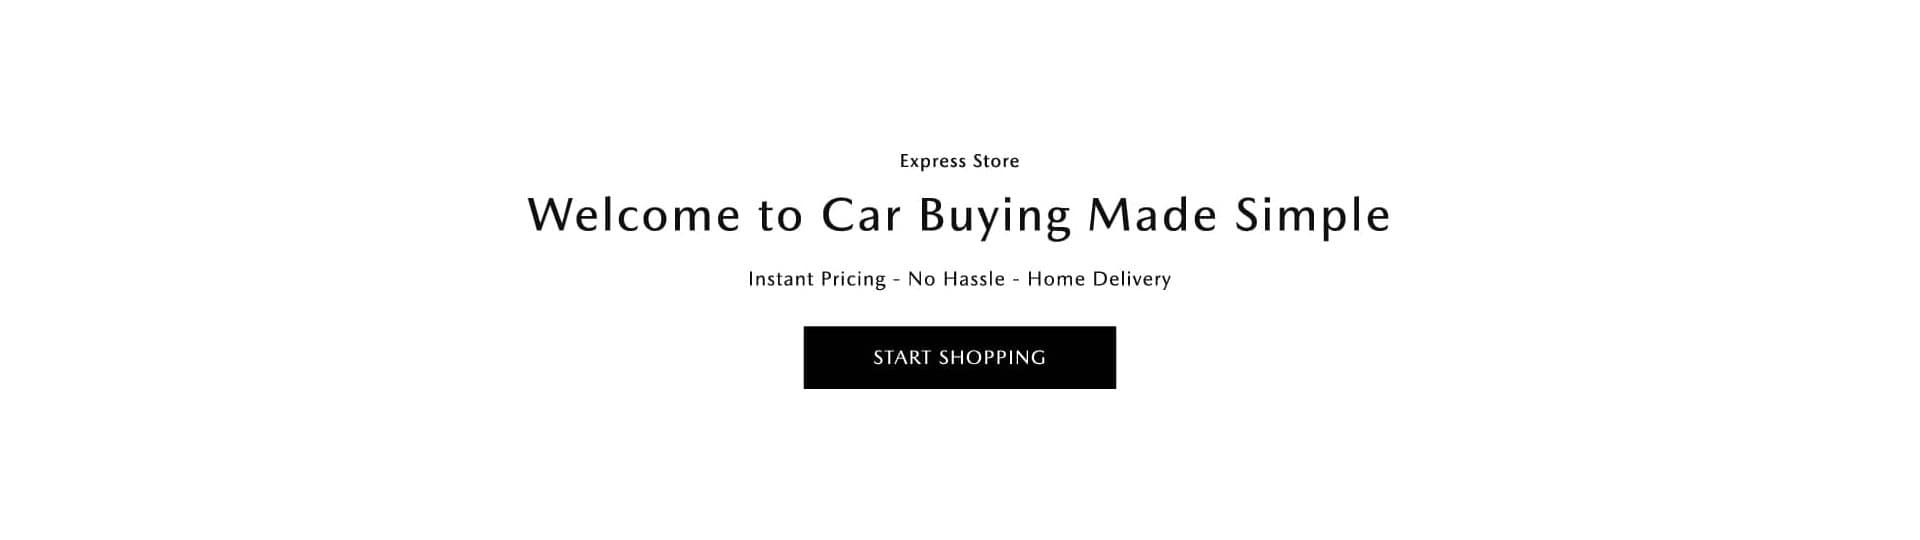 Balise Mazda Express Store